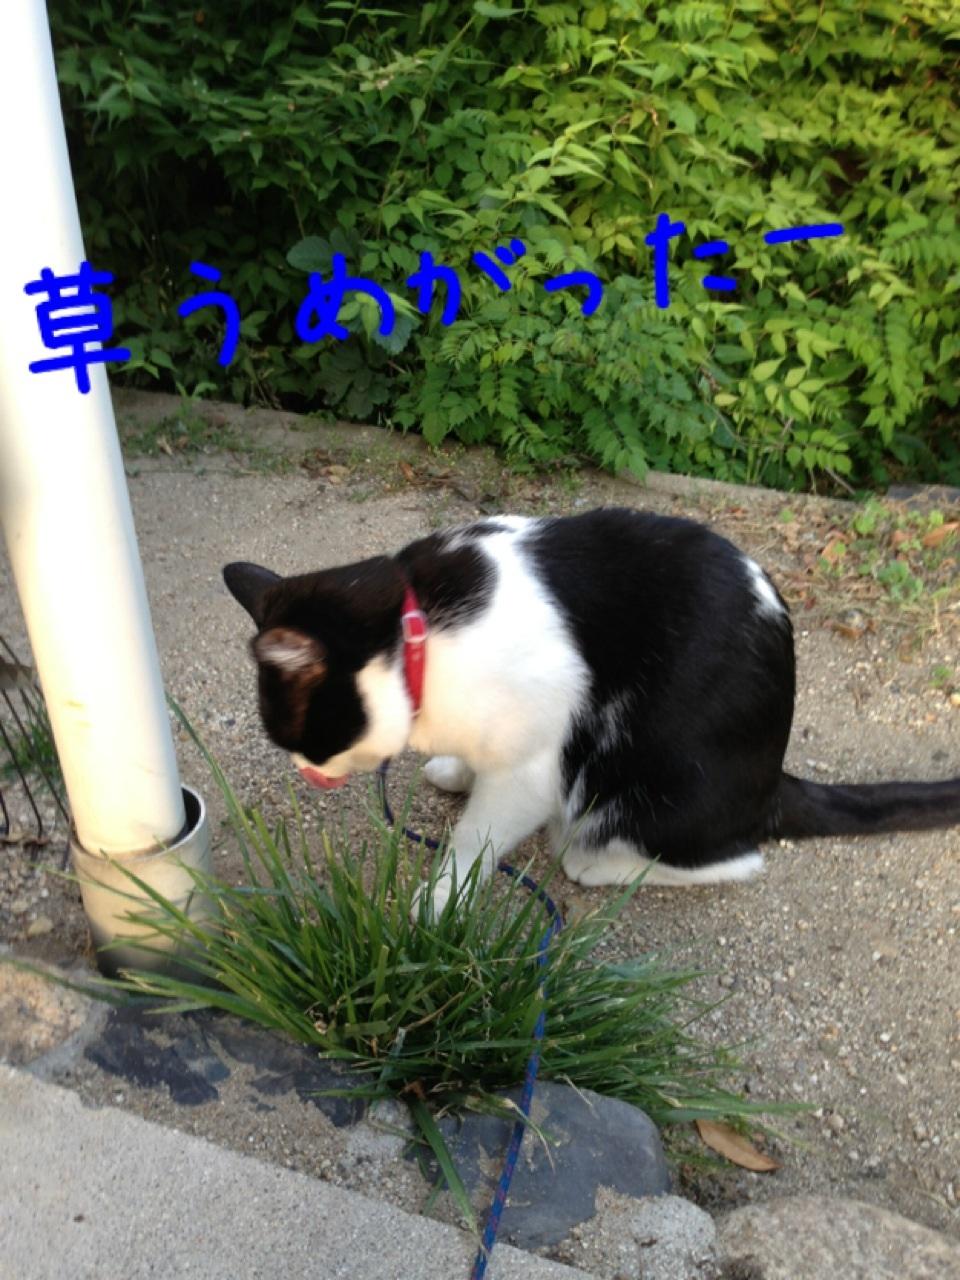 image_20130525000839.jpg